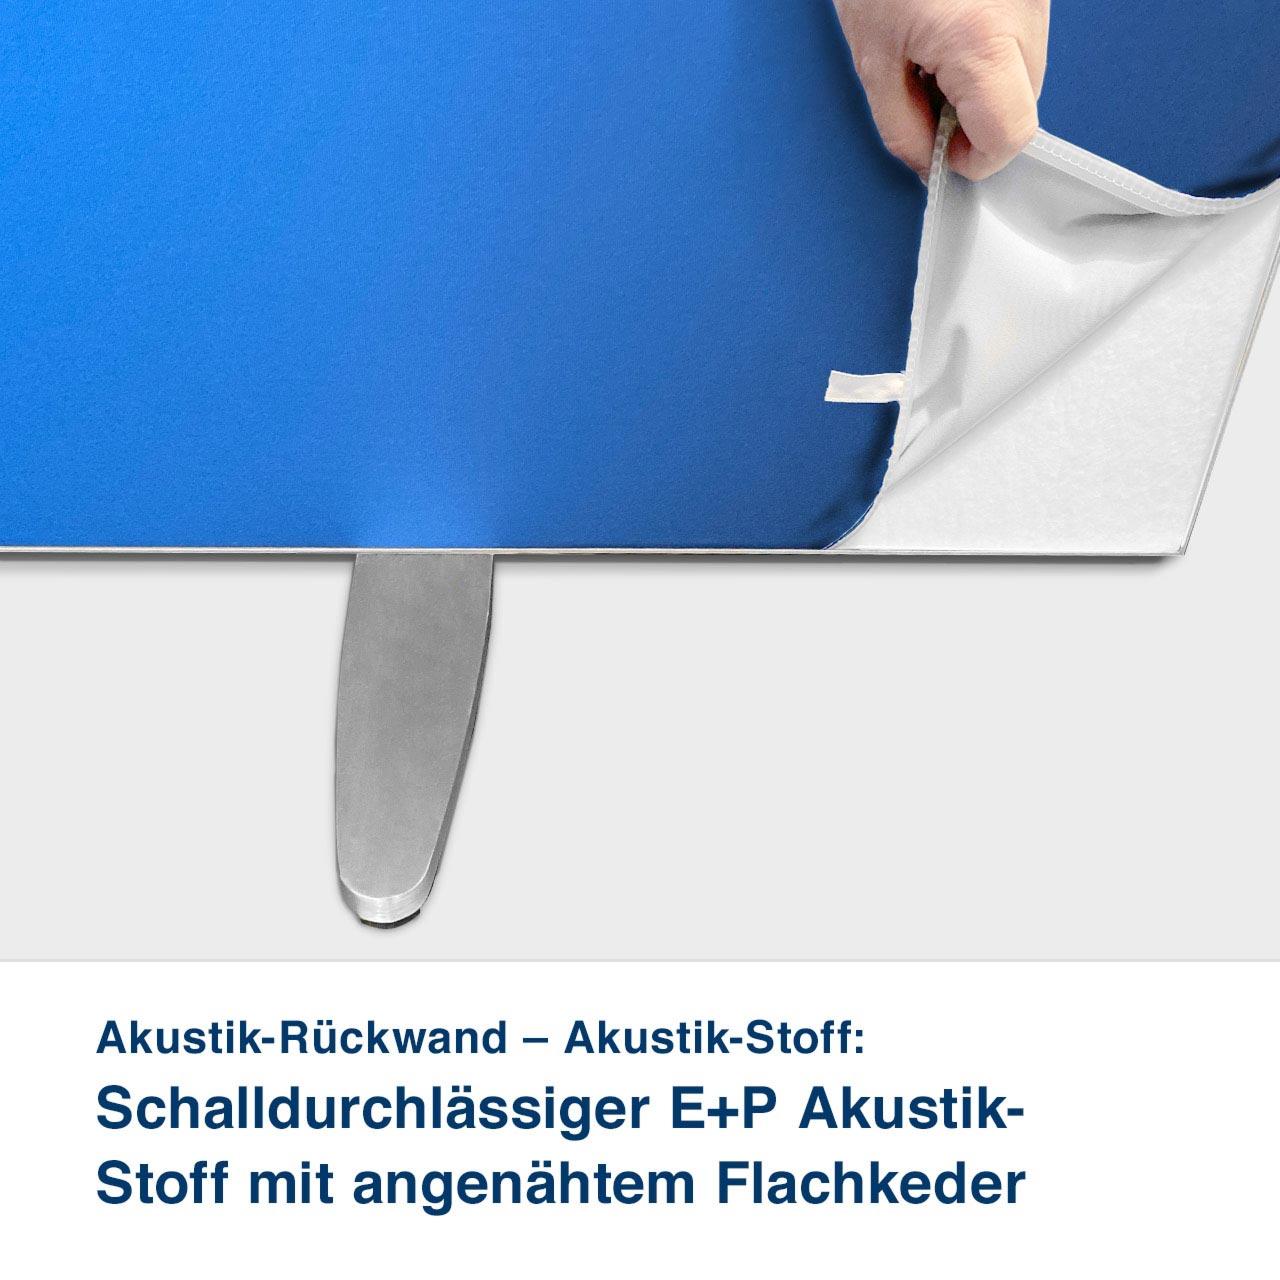 Akustik-Rückwand – Akustik-Stoff:   Schalldurchlässiger E+P Akustik-  Stoff mit angenähtem Flachkeder